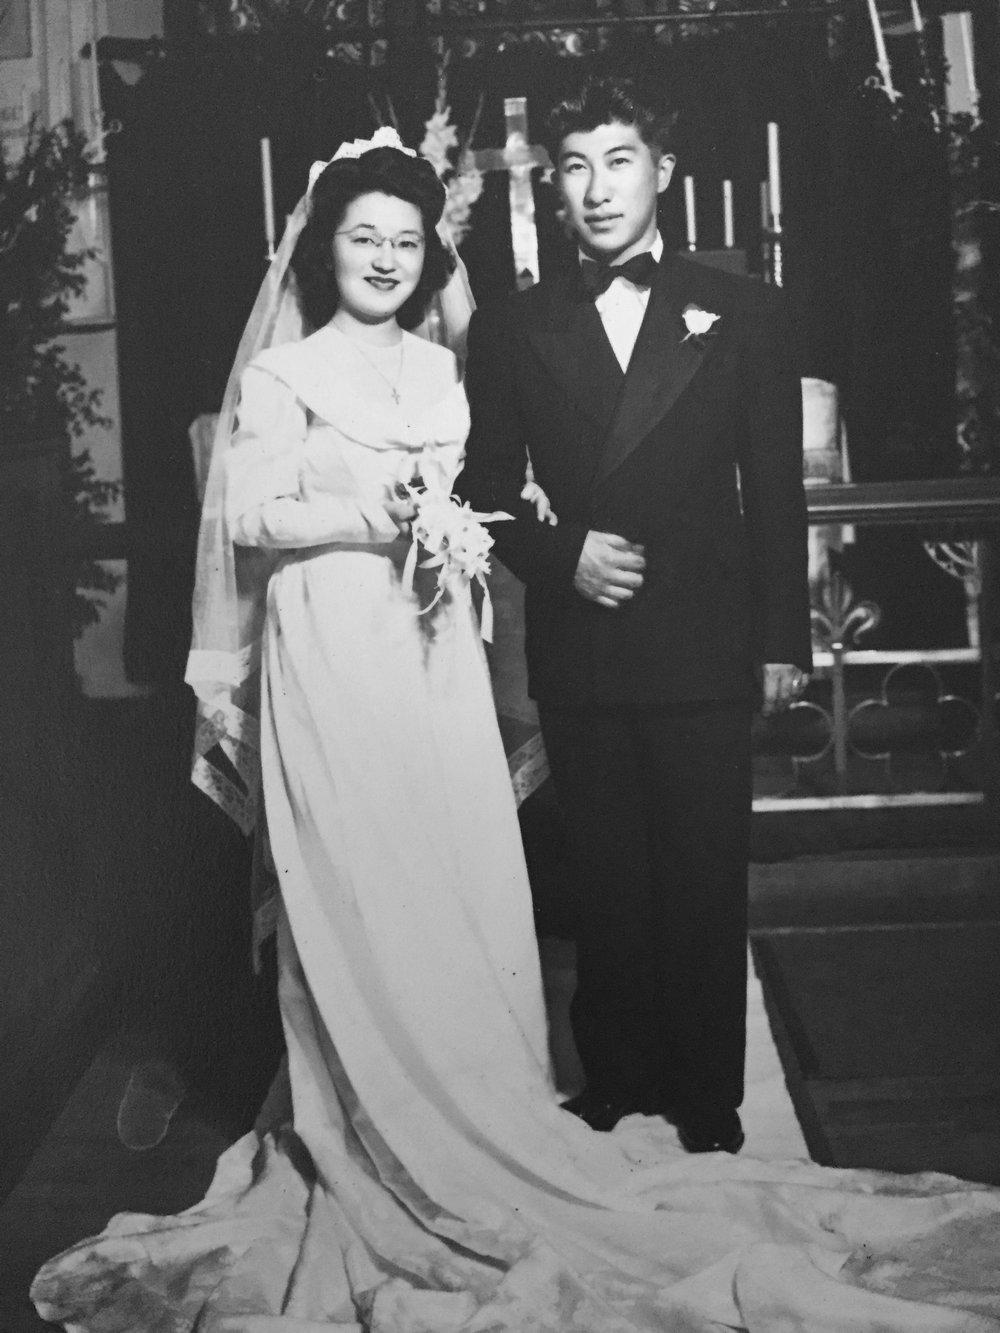 Maru and Jordan on their wedding day in Ogden, Utah